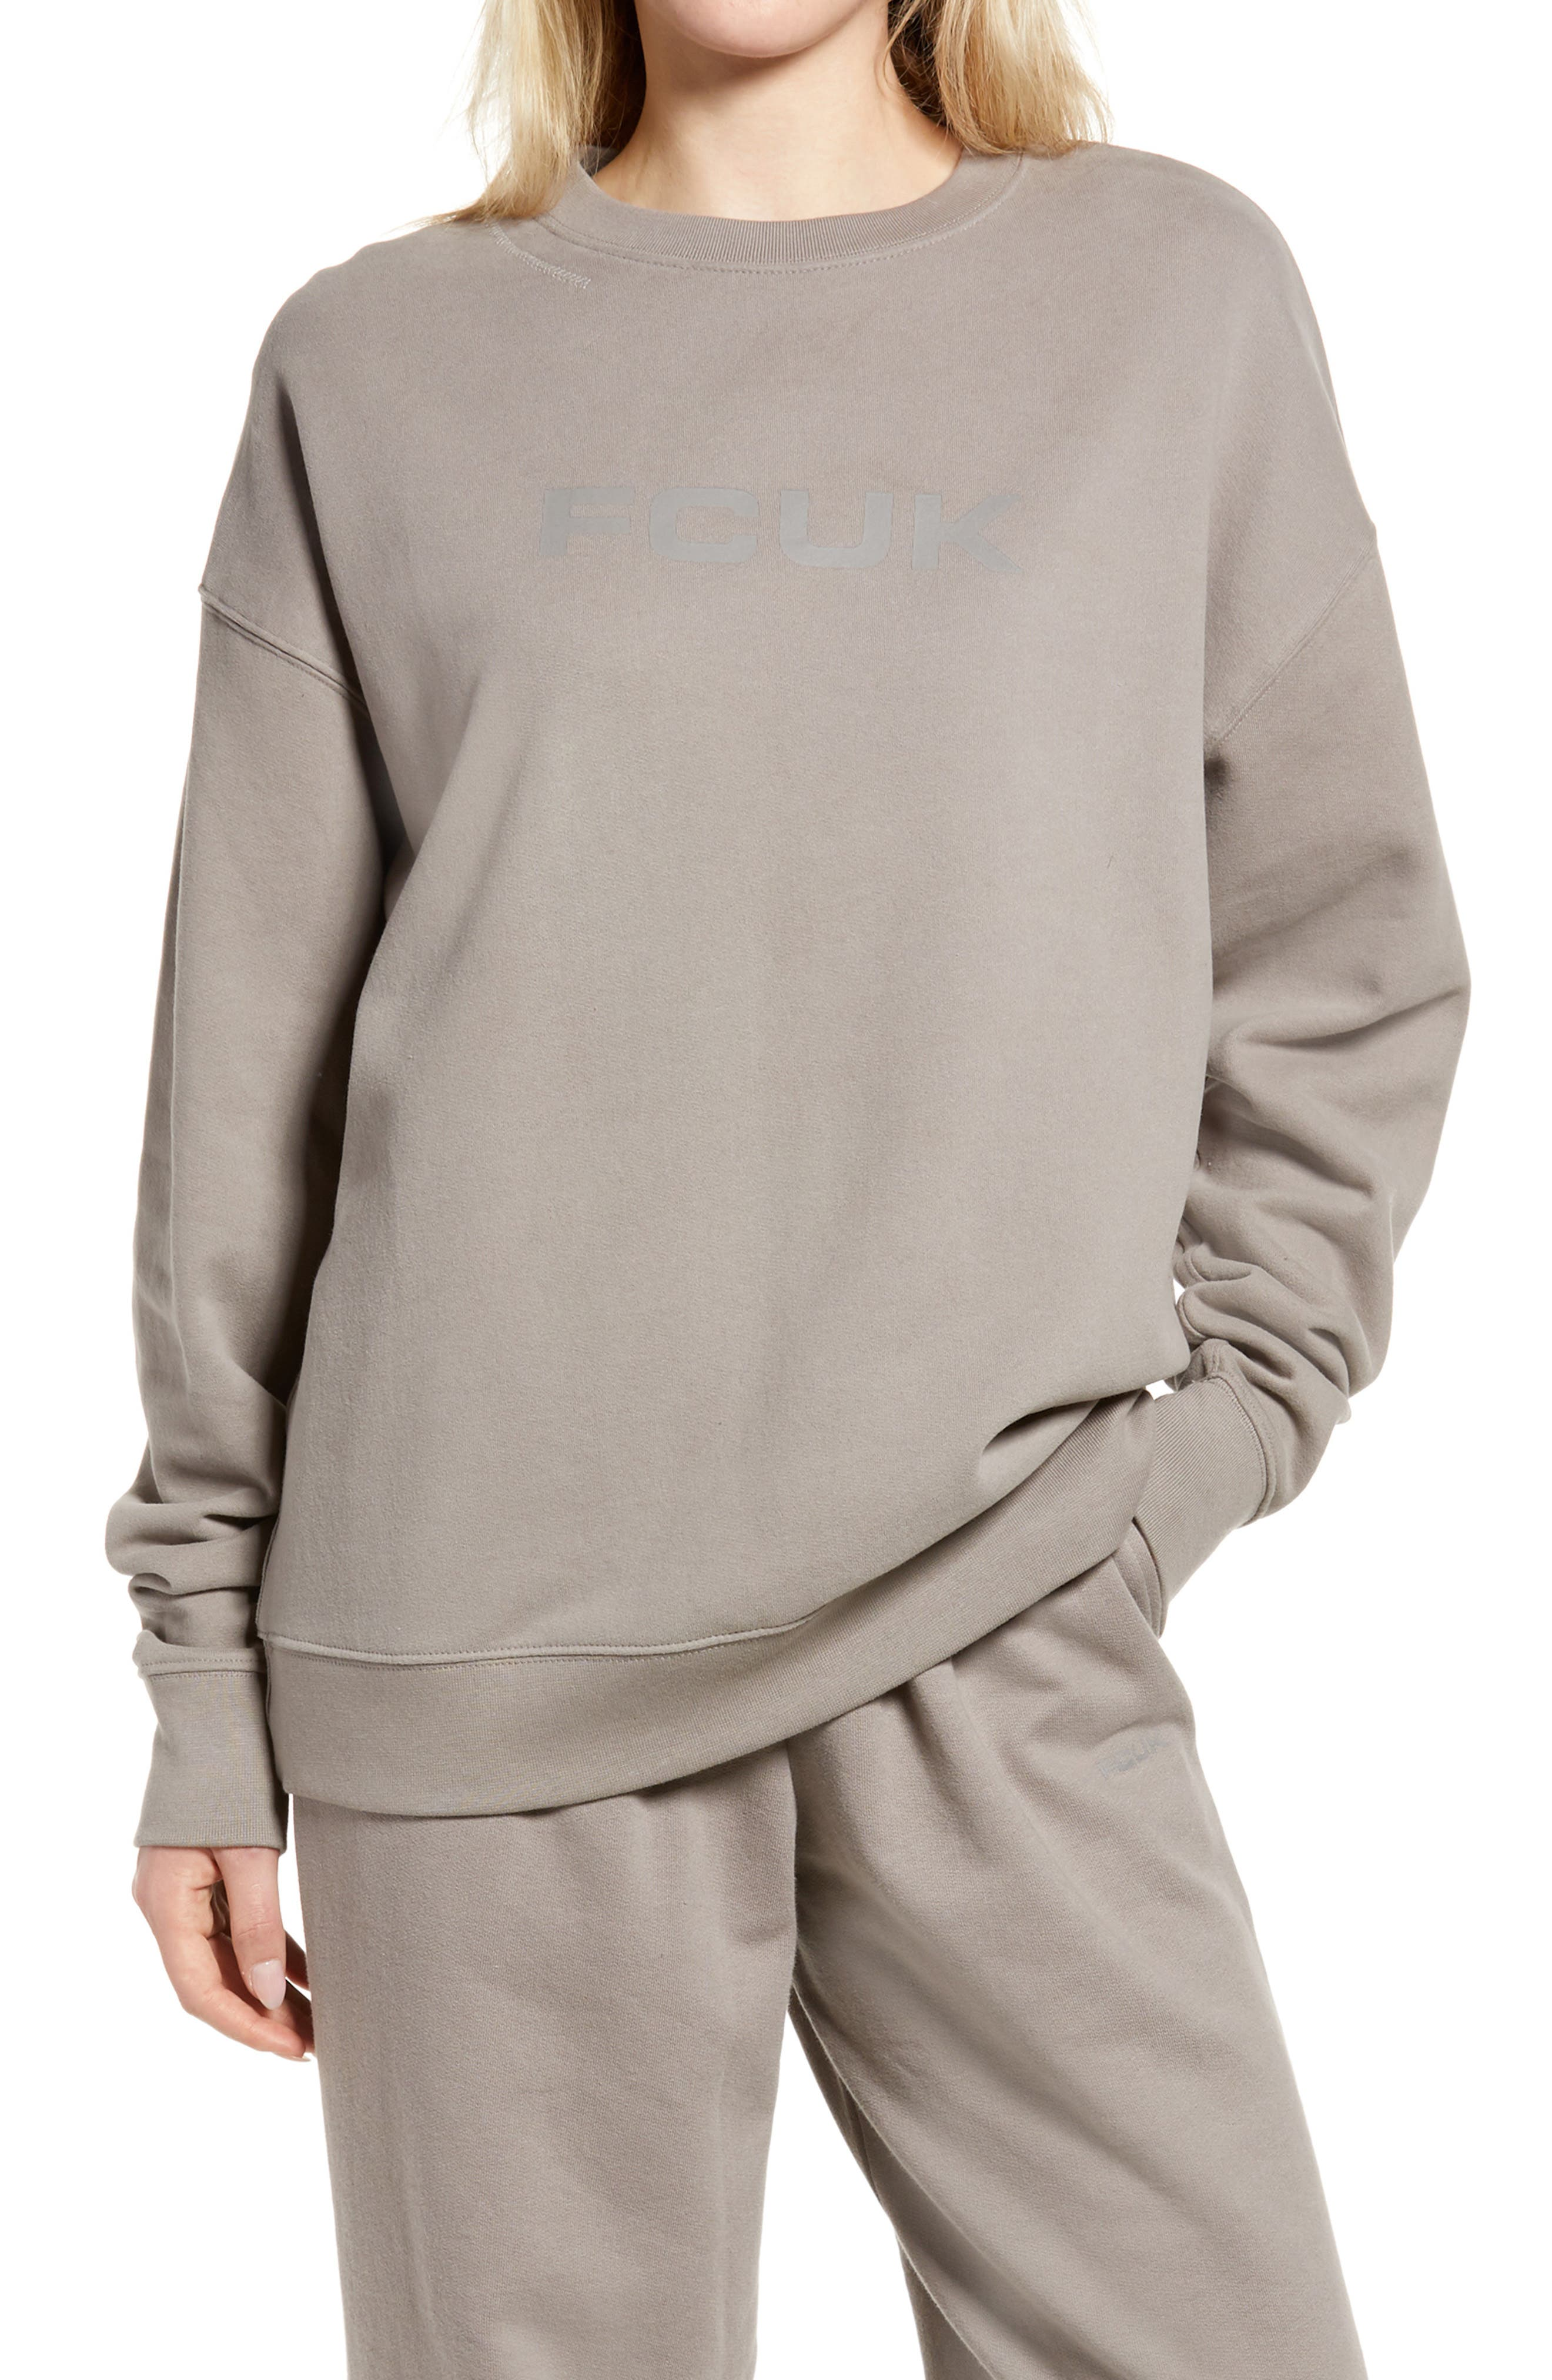 Women's Oversize Graphic Sweatshirt